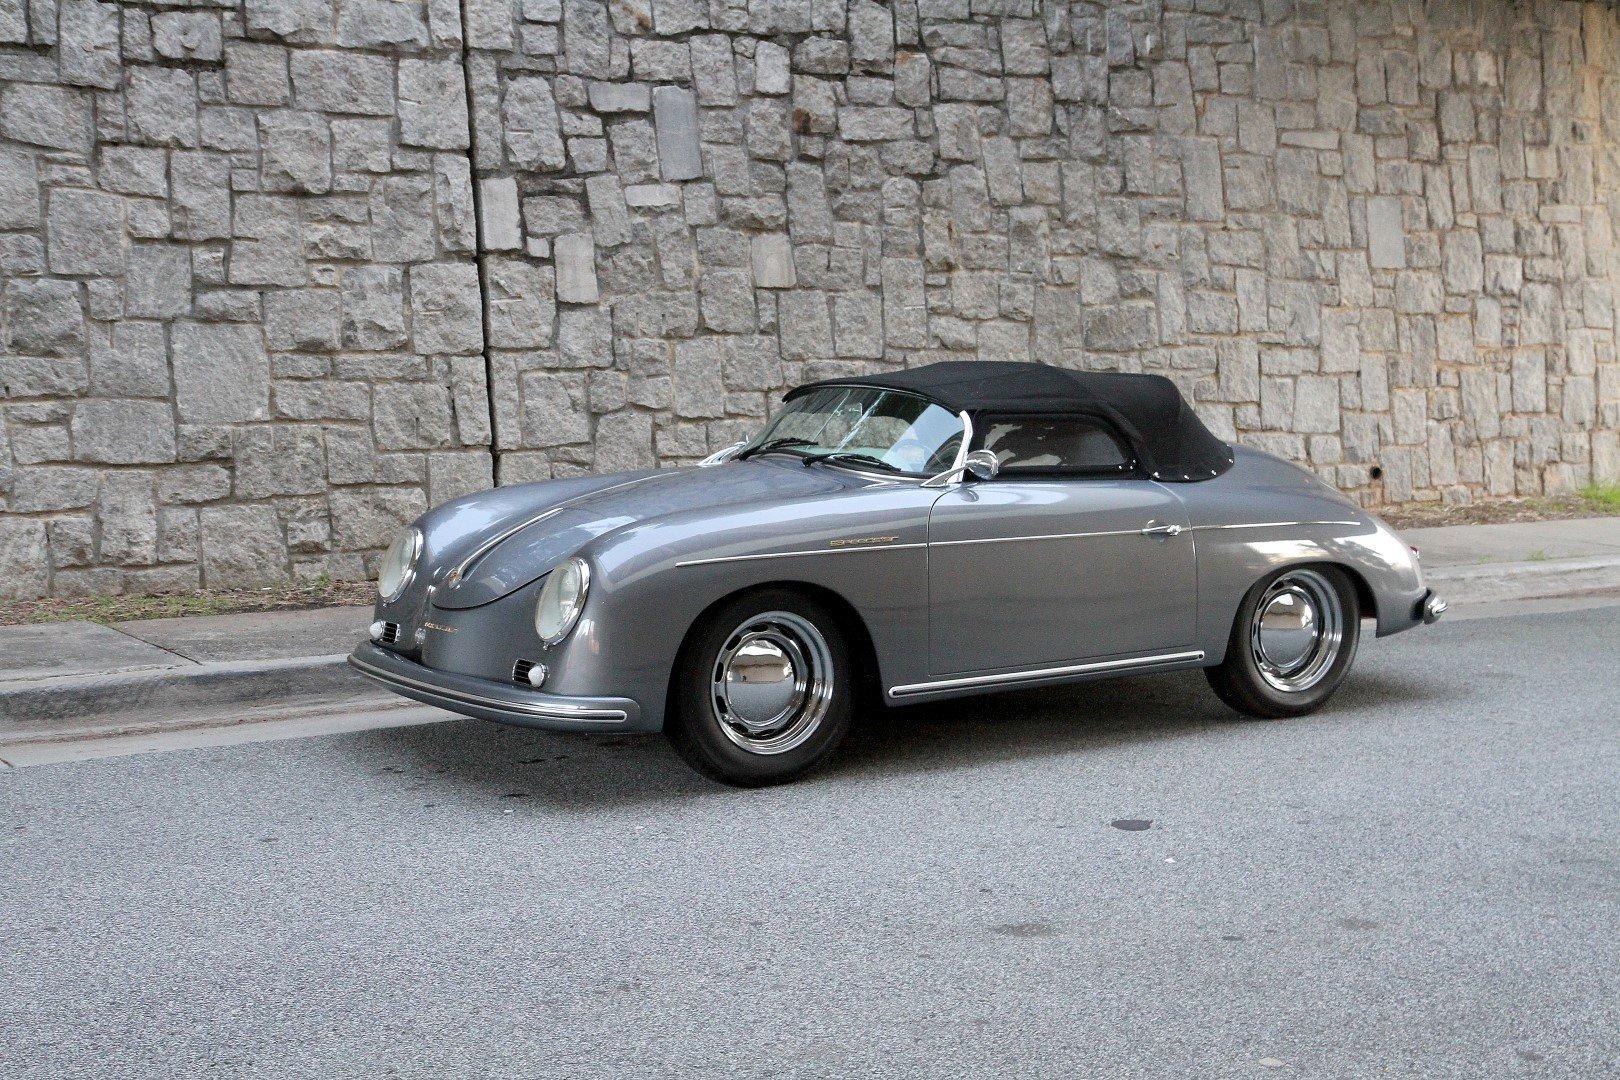 1957 Porsche 356 Speedster Replica for sale #36409 | Motorious